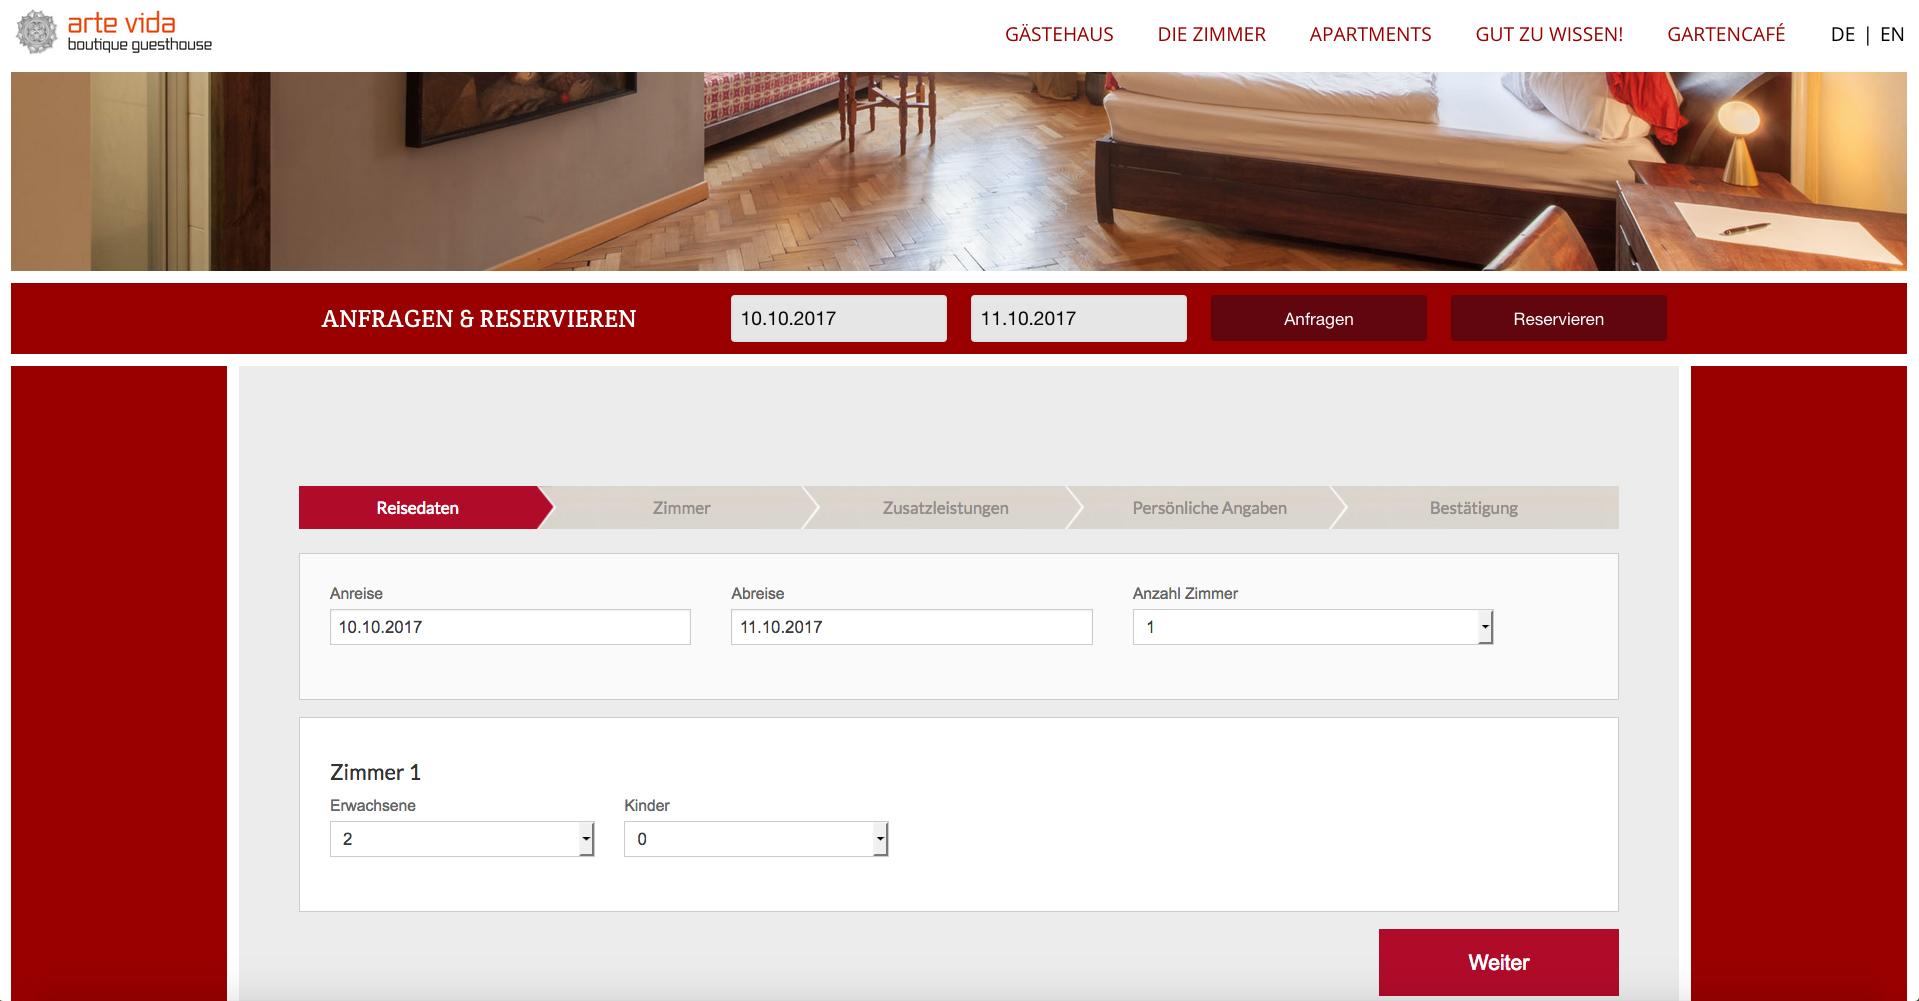 Fresh Herbs Communications Marketing Projektmanagement Website Salzburg_37_arte vida boutique guesthouse